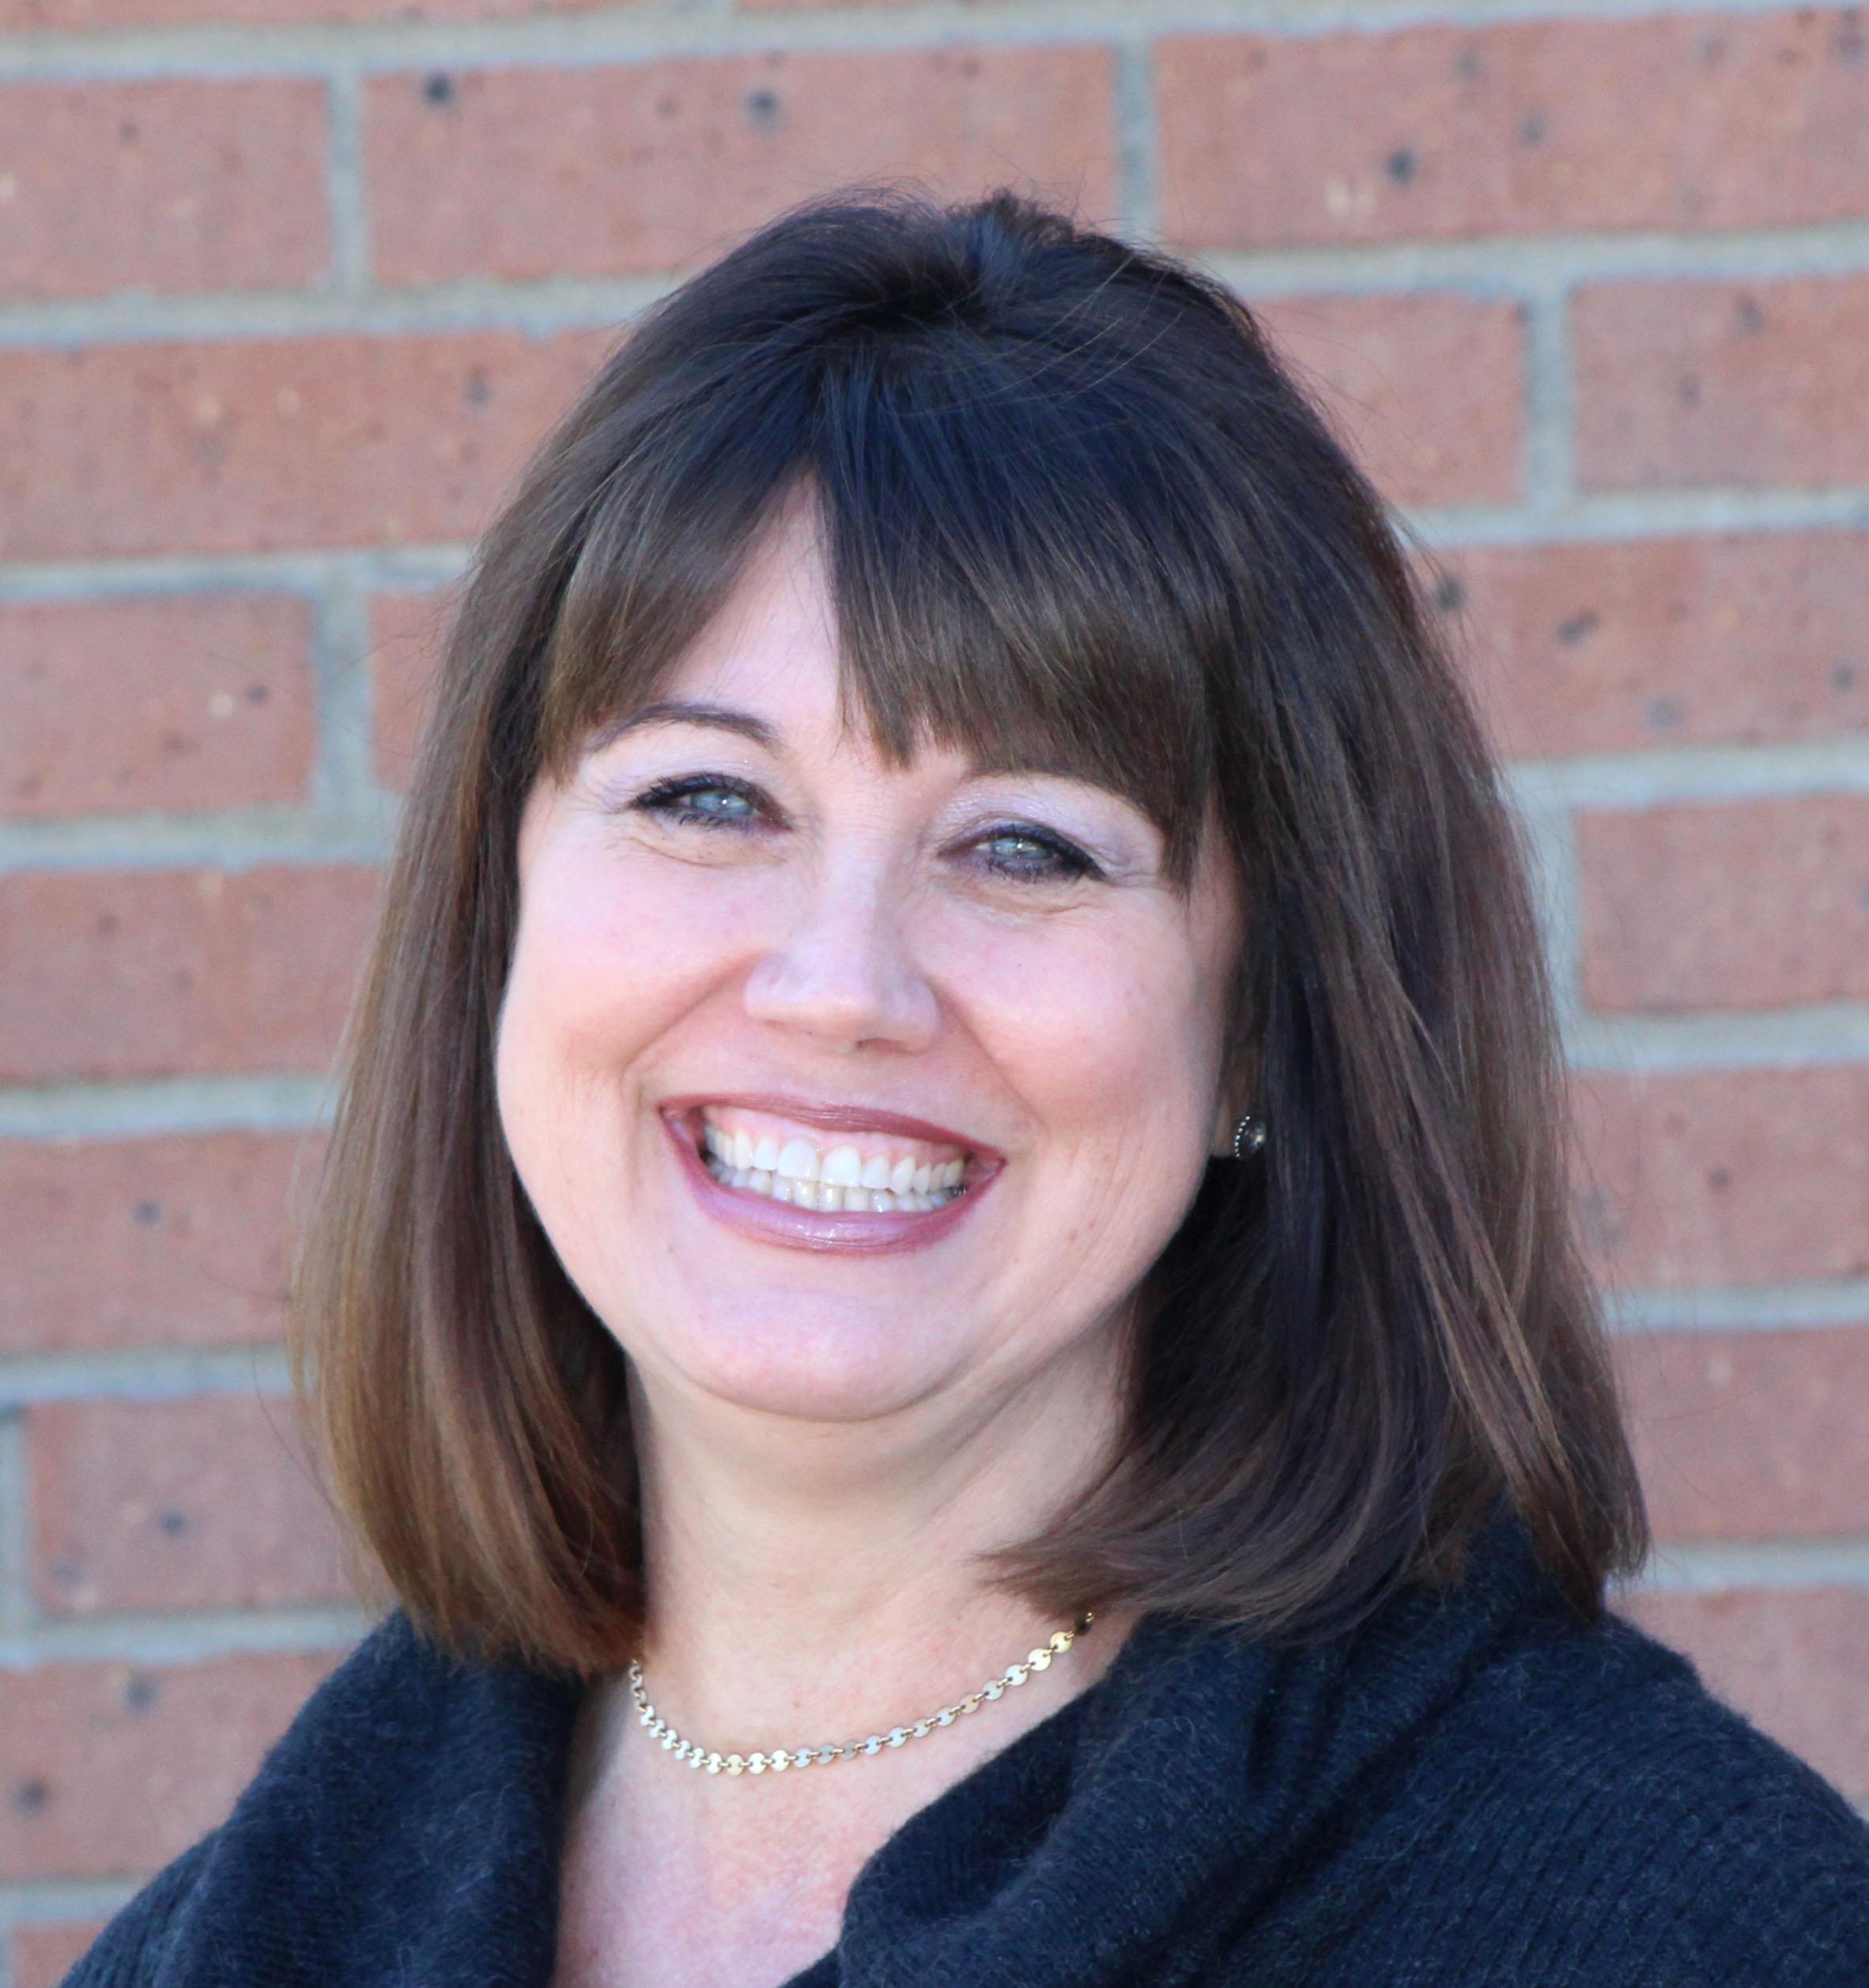 Shannon Adkins